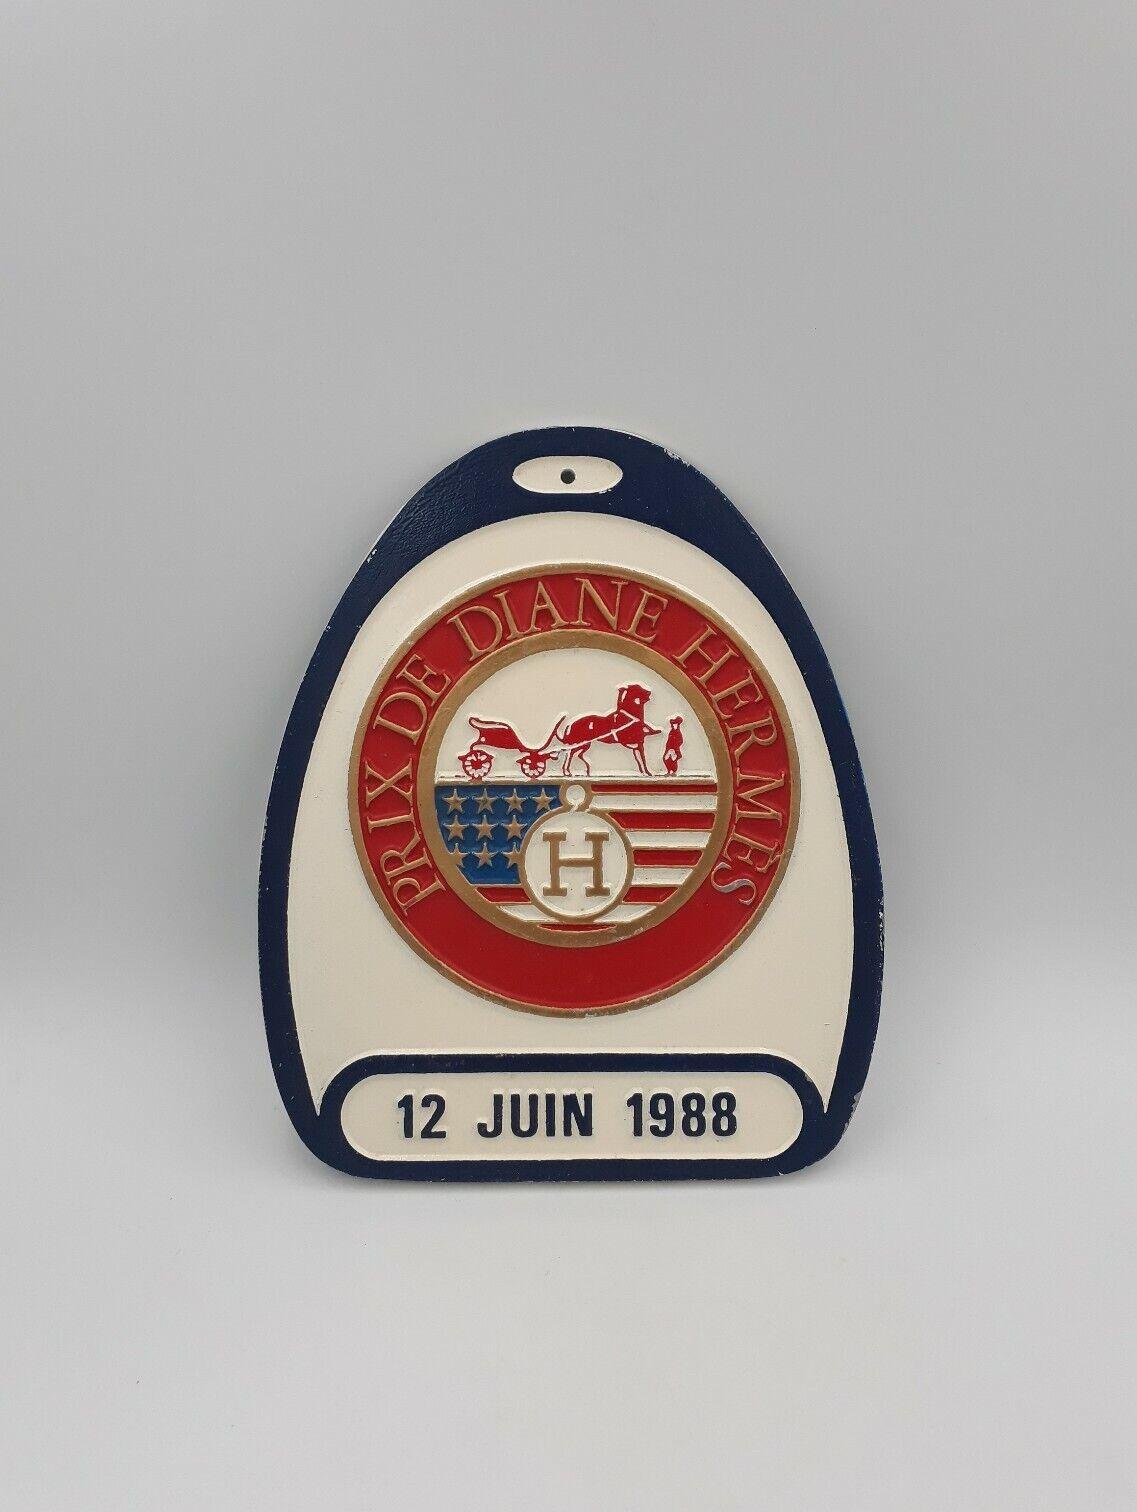 Plaque Prix de Diane HERMES 1988 chantilly S TAUPINARD luxe equitation stirrup